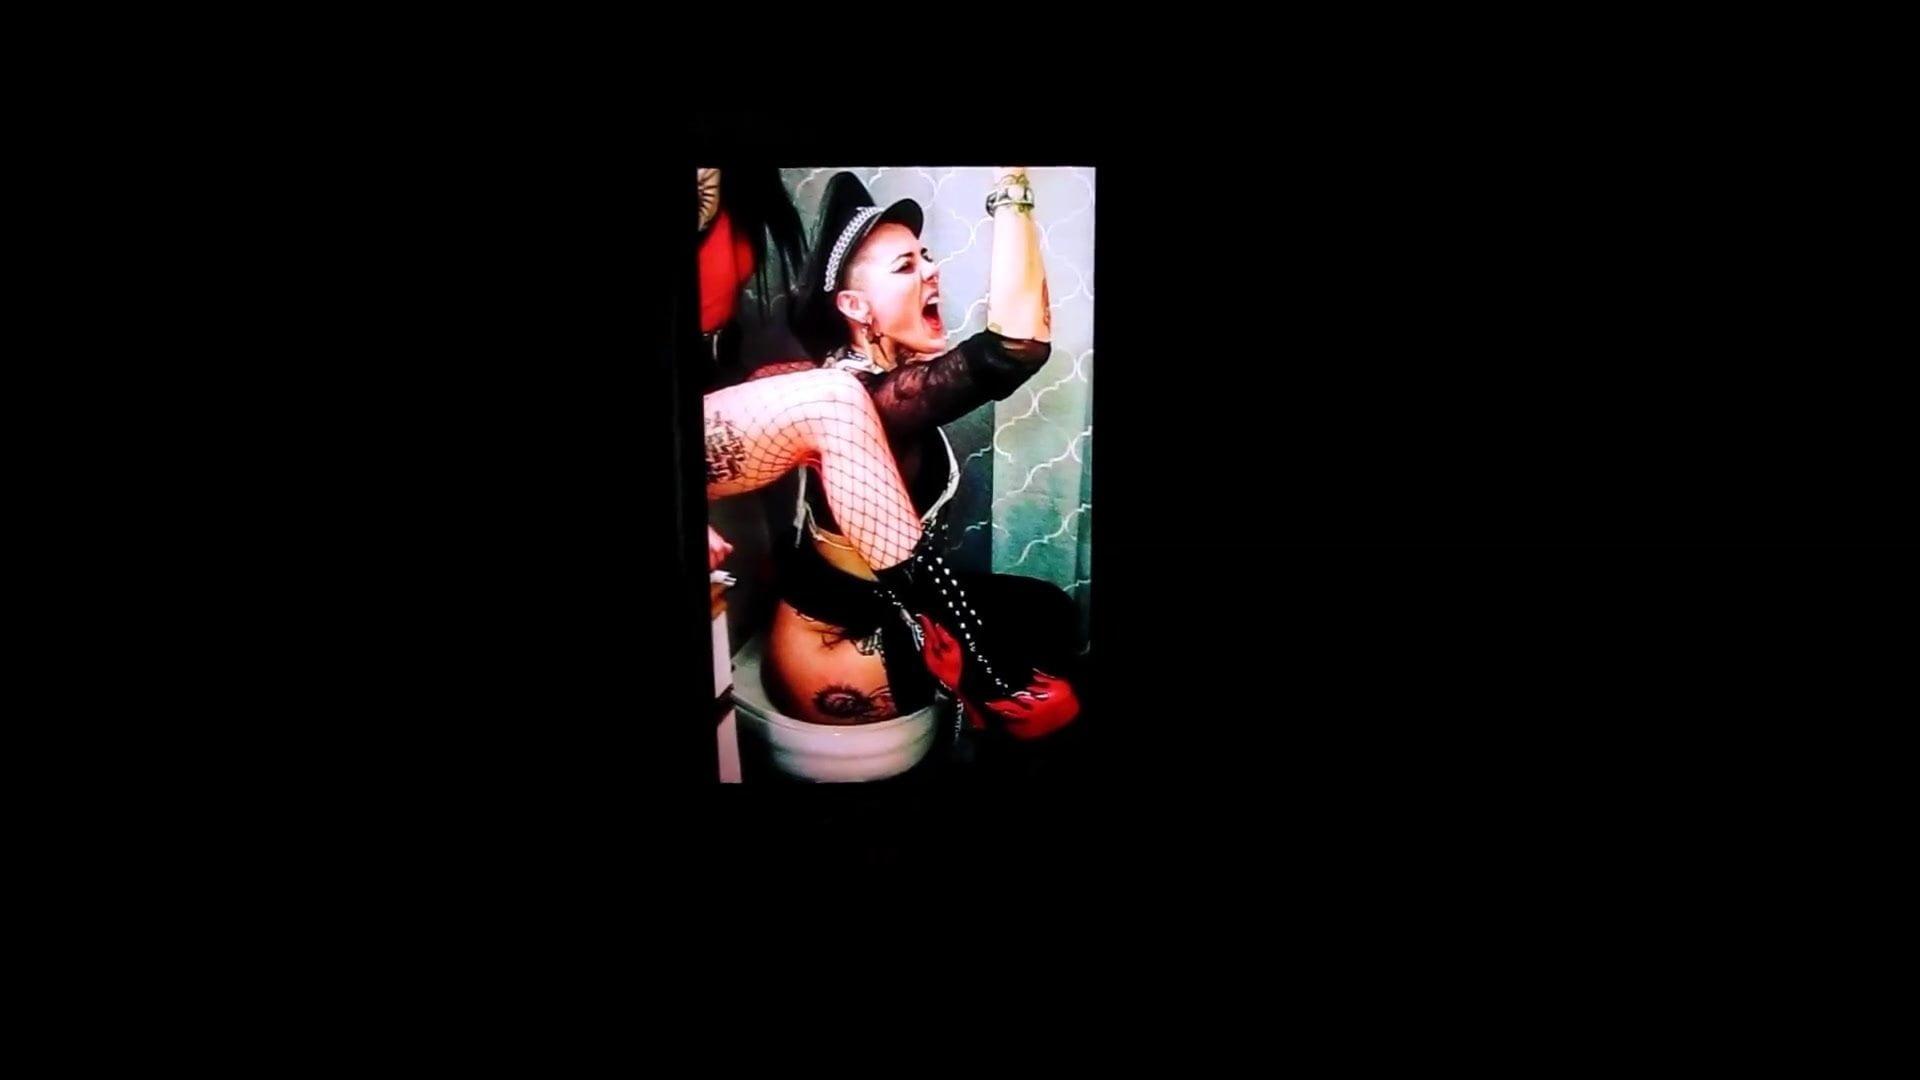 Sophie Seaman-Cass on a toilet cum tribute